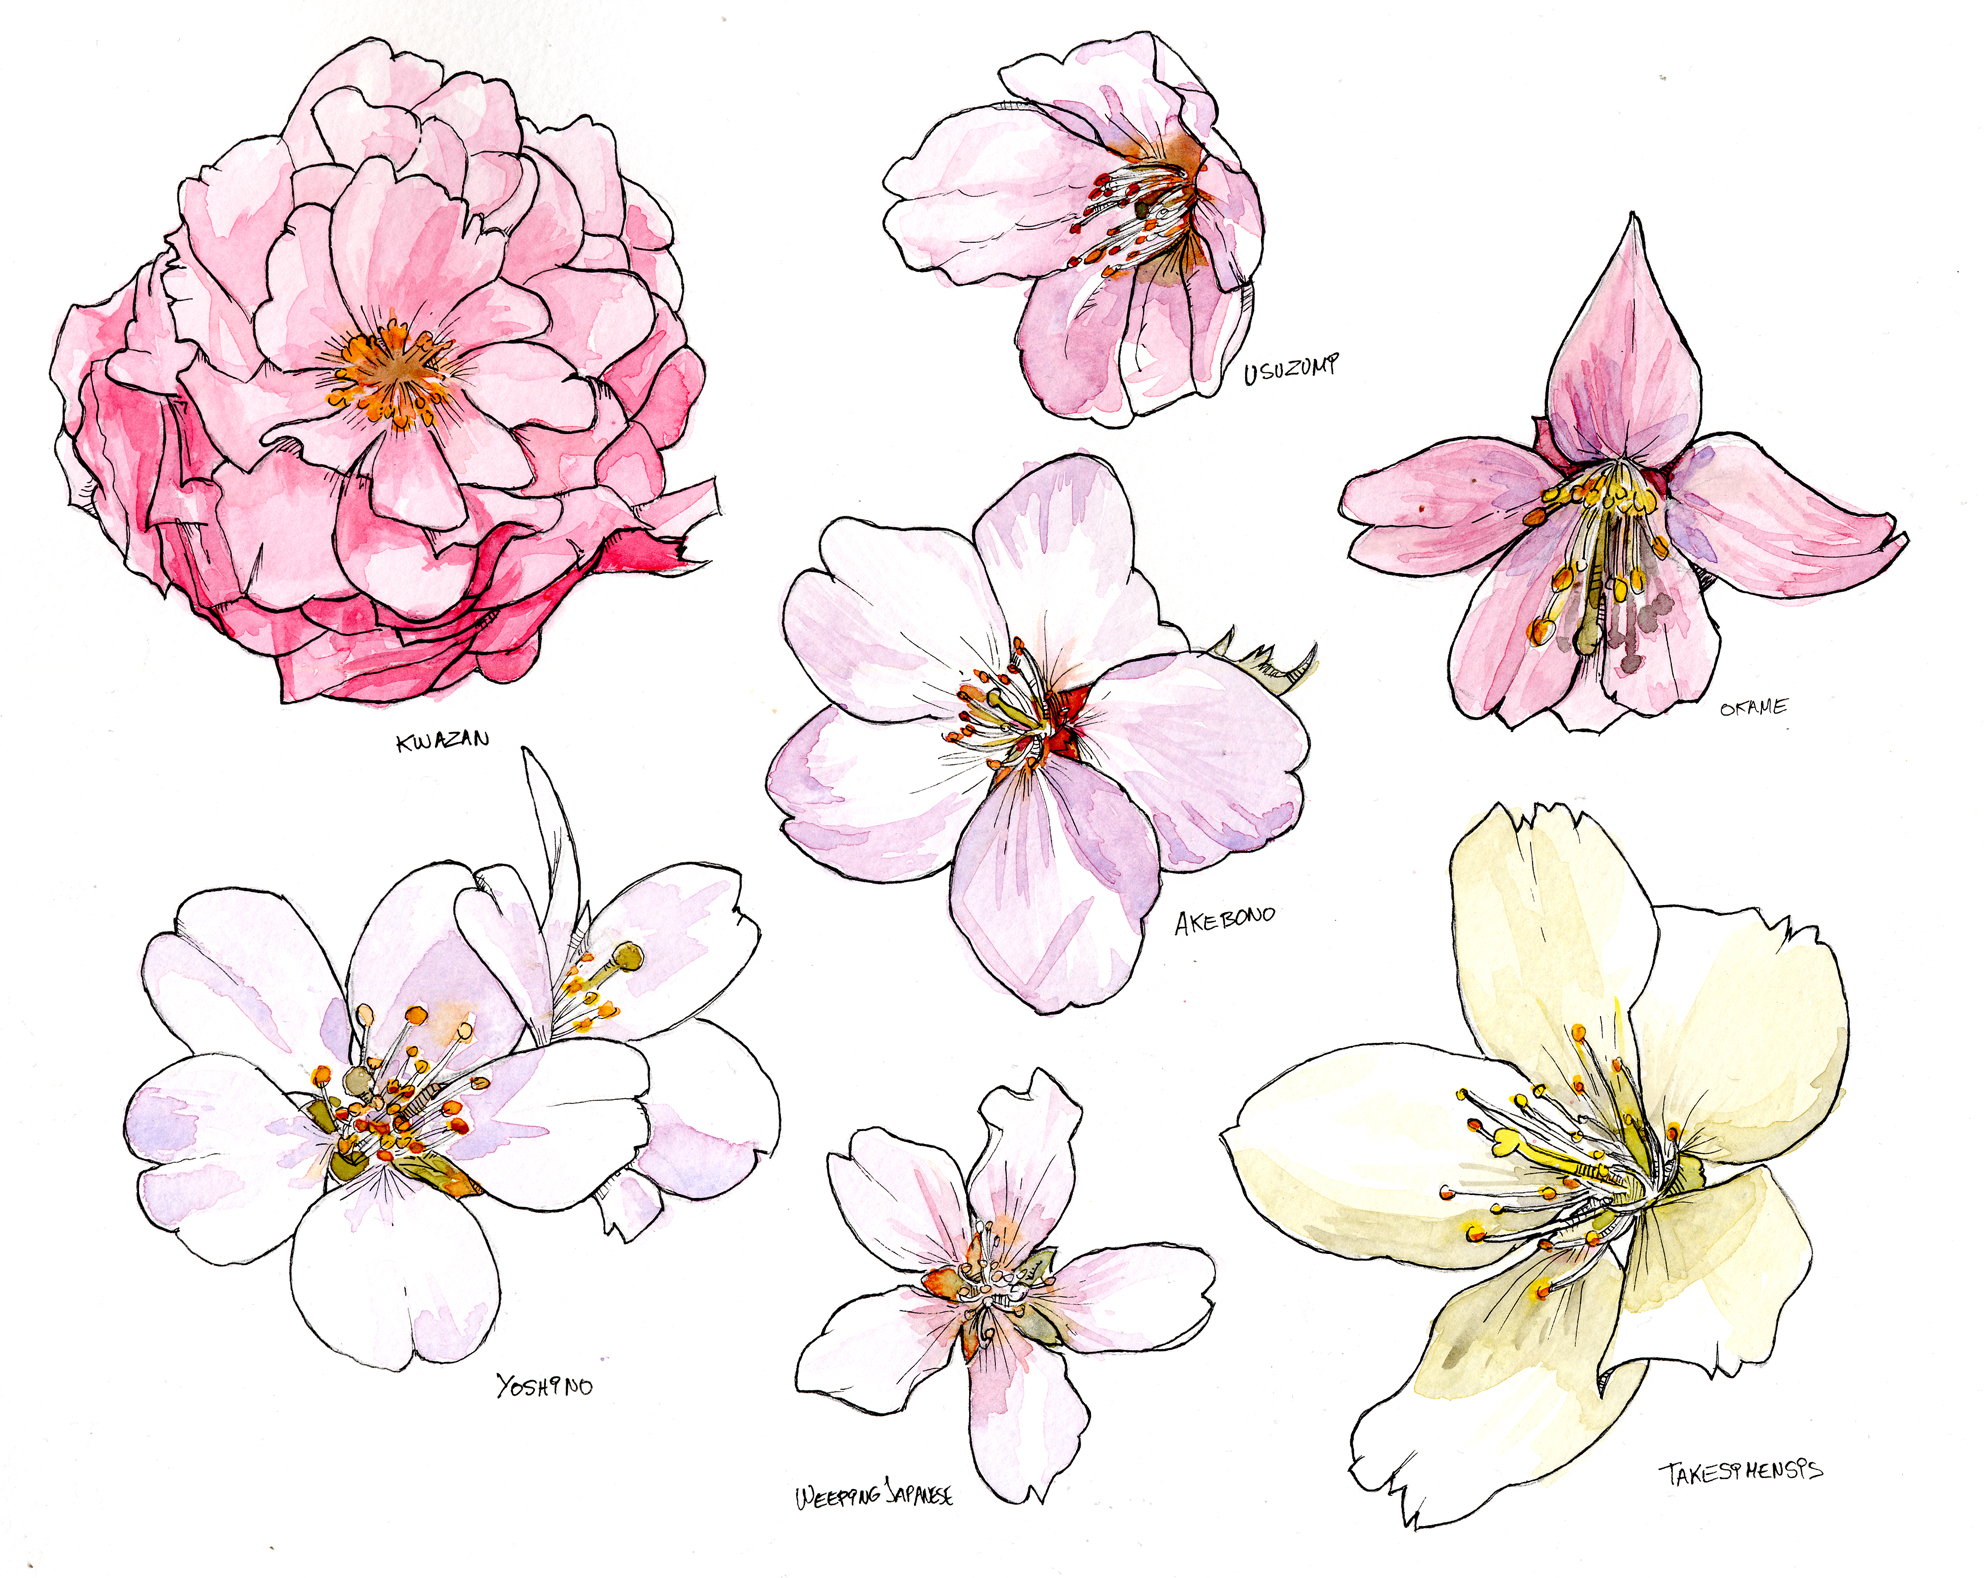 1984x1578 Sakura Flower Drawing Drawn Cherry Blossom Sakura Flower